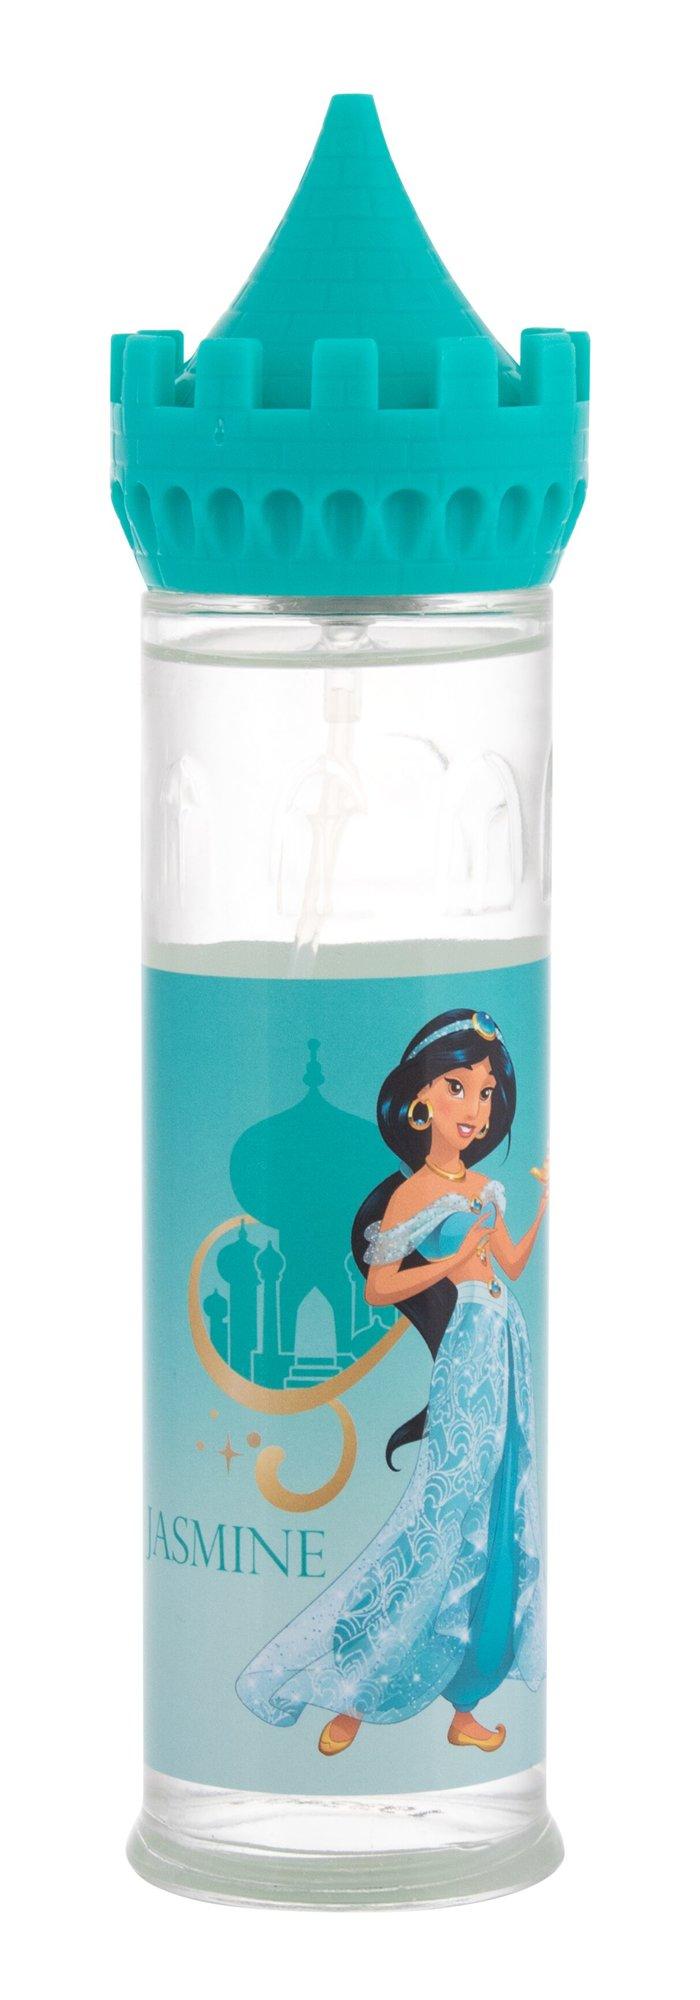 Disney Princess Jasmine